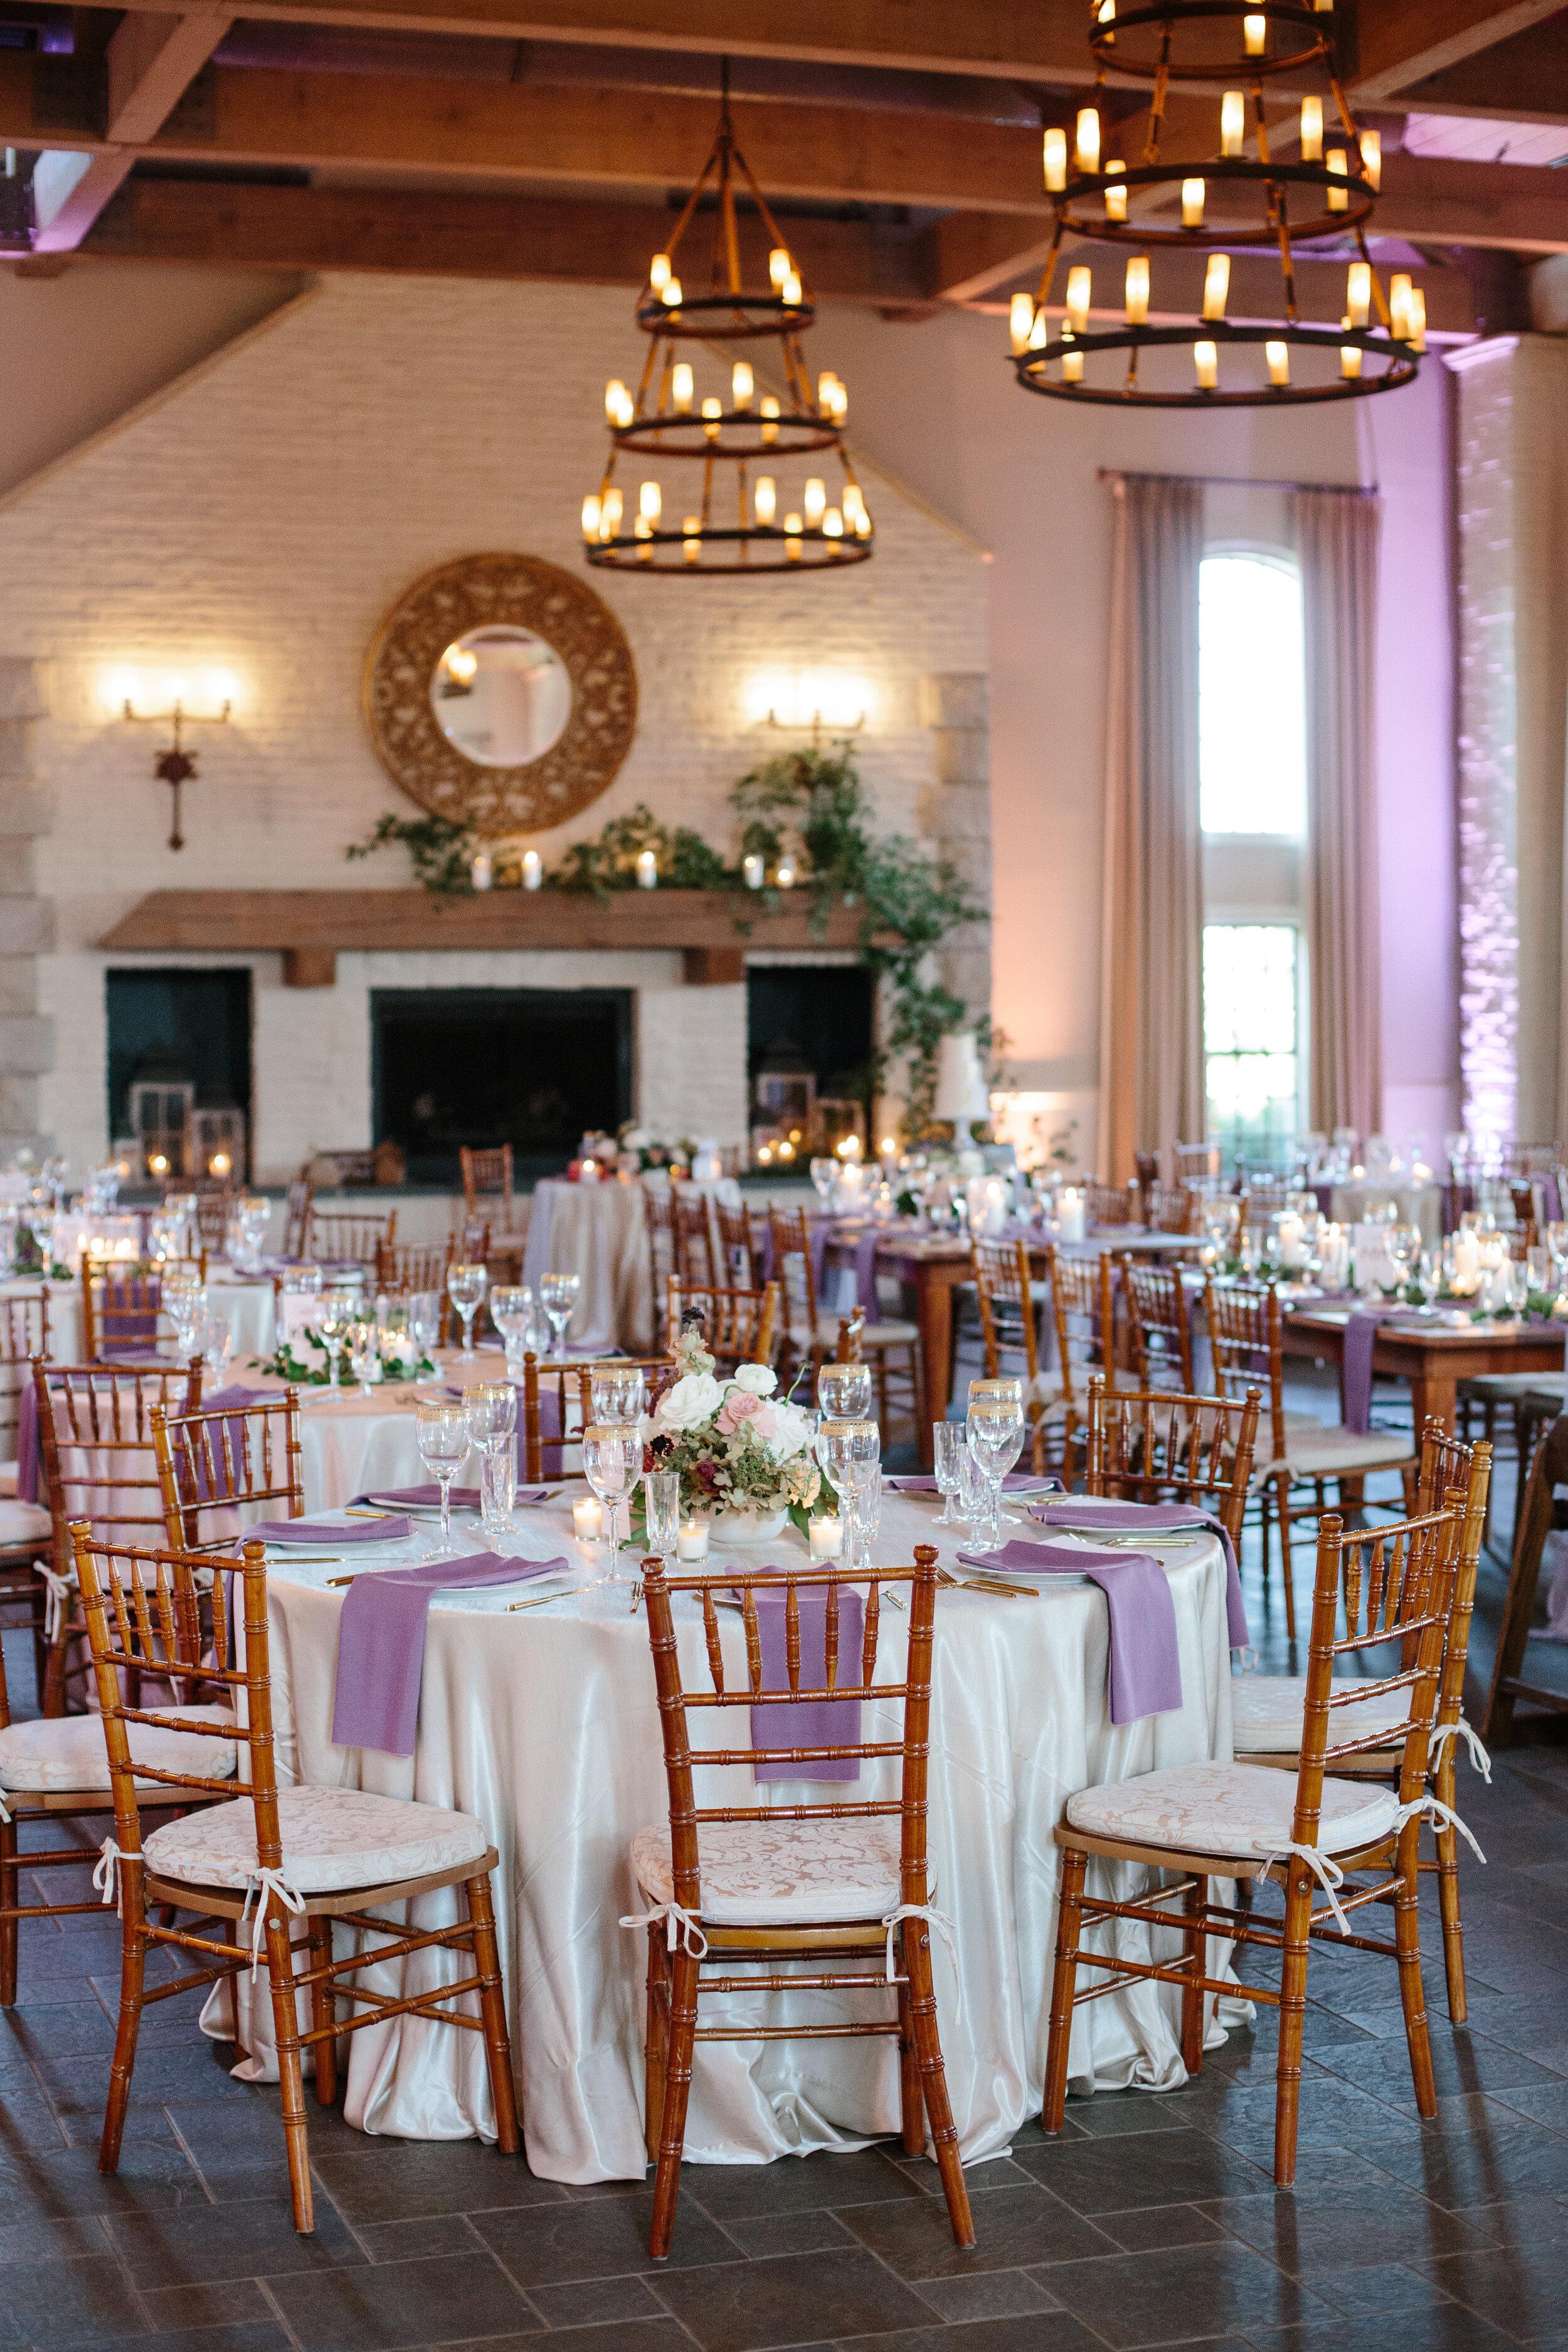 Shante-Asteway-Wedding-Andrew-Roby-Events-6.jpg..jpg